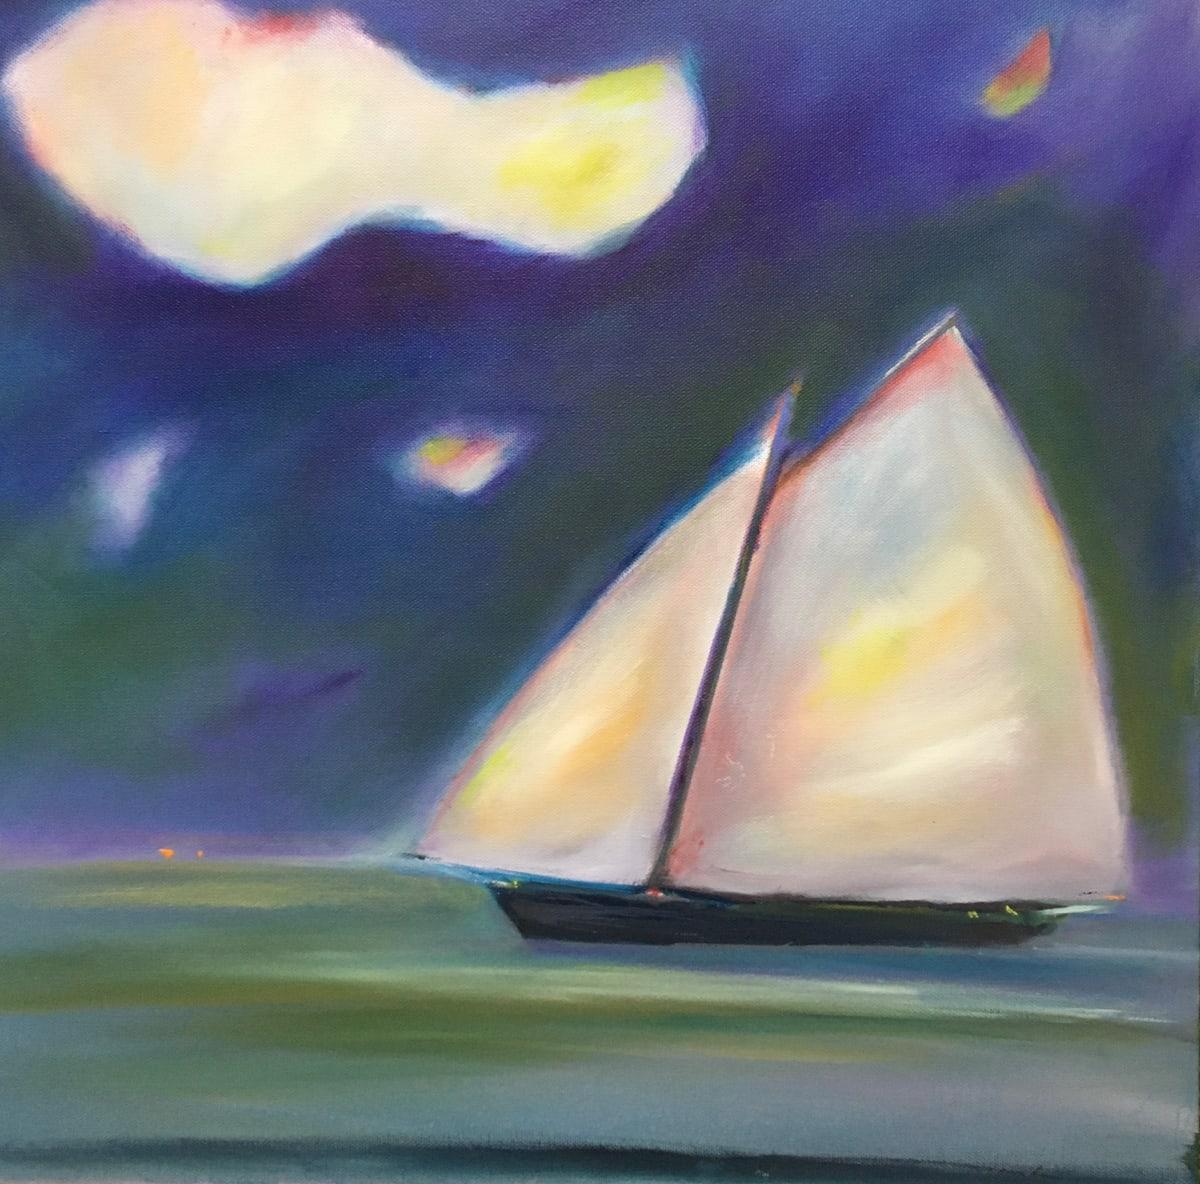 Sailboat, Dusk by Marston Clough